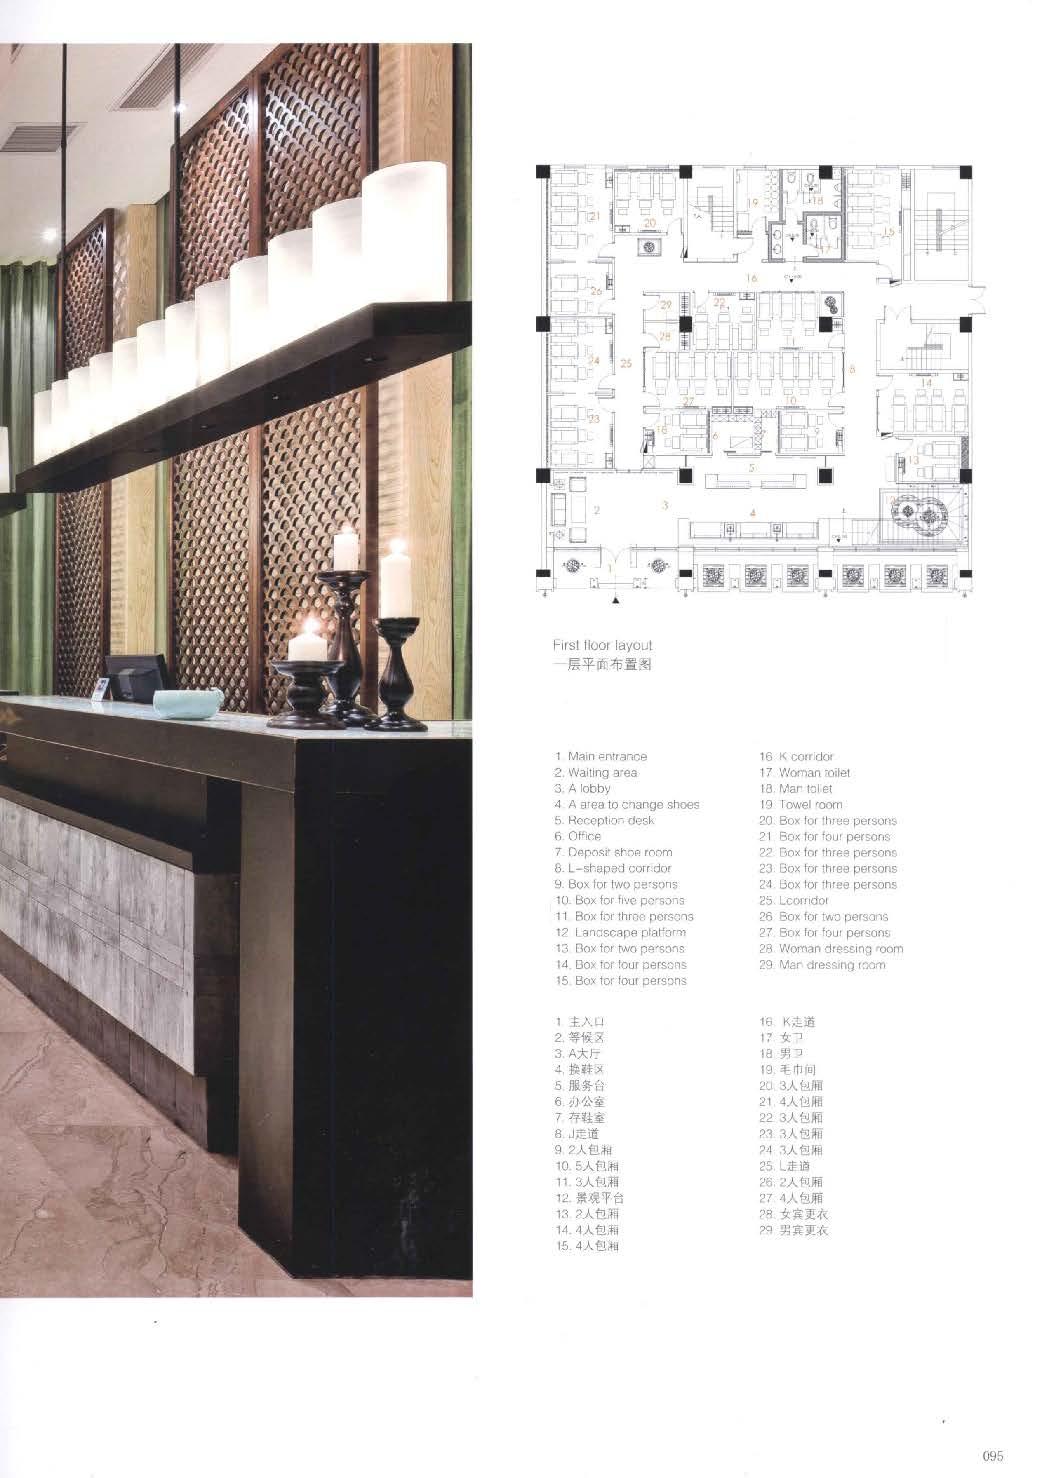 H073 东方风情 会所、餐饮细部解析_Page_093.jpg